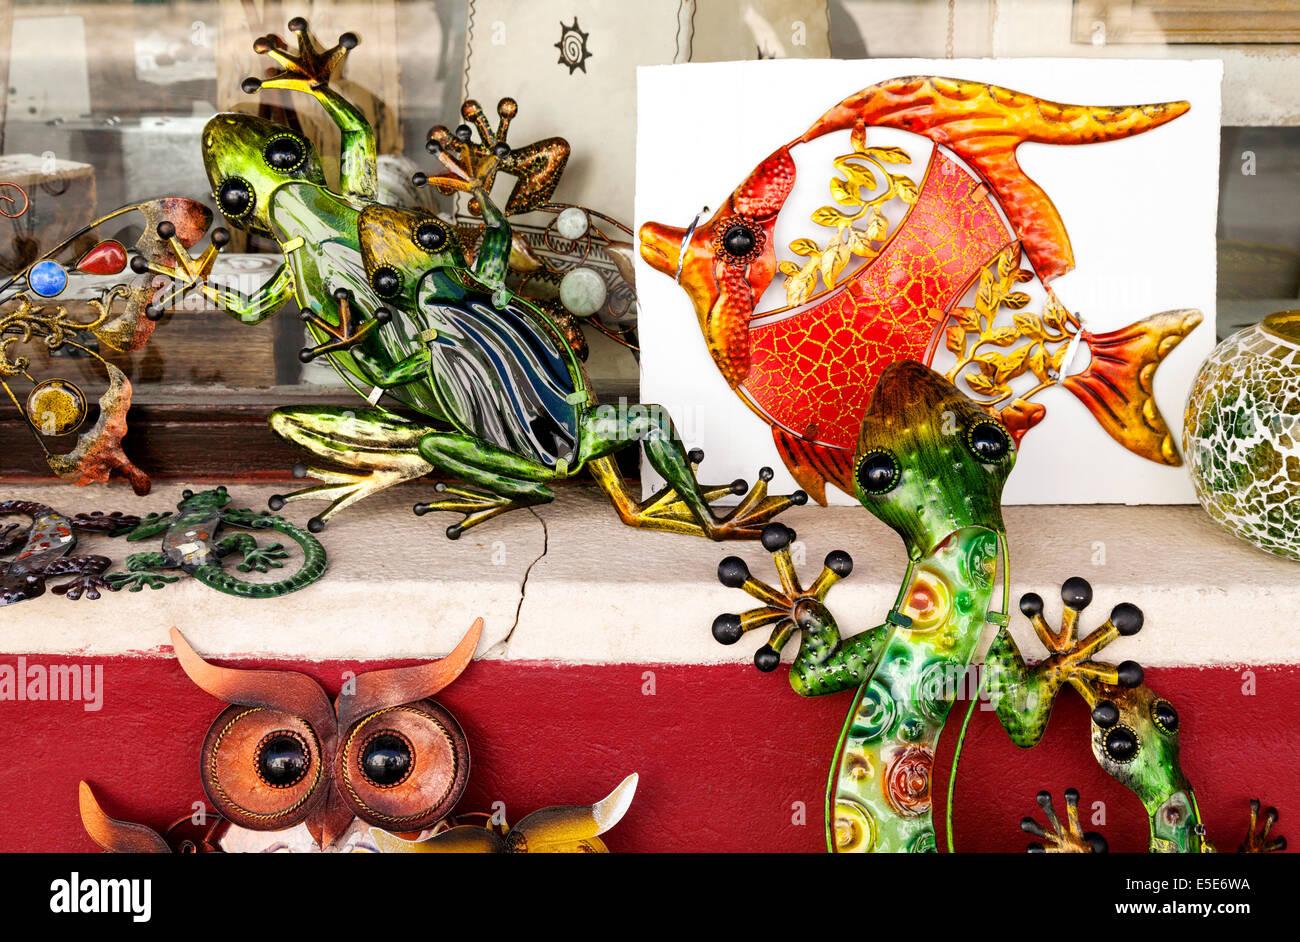 Craft shop or gift store, Carvoeiro, Algarve, Portugal Europe Stock Photo